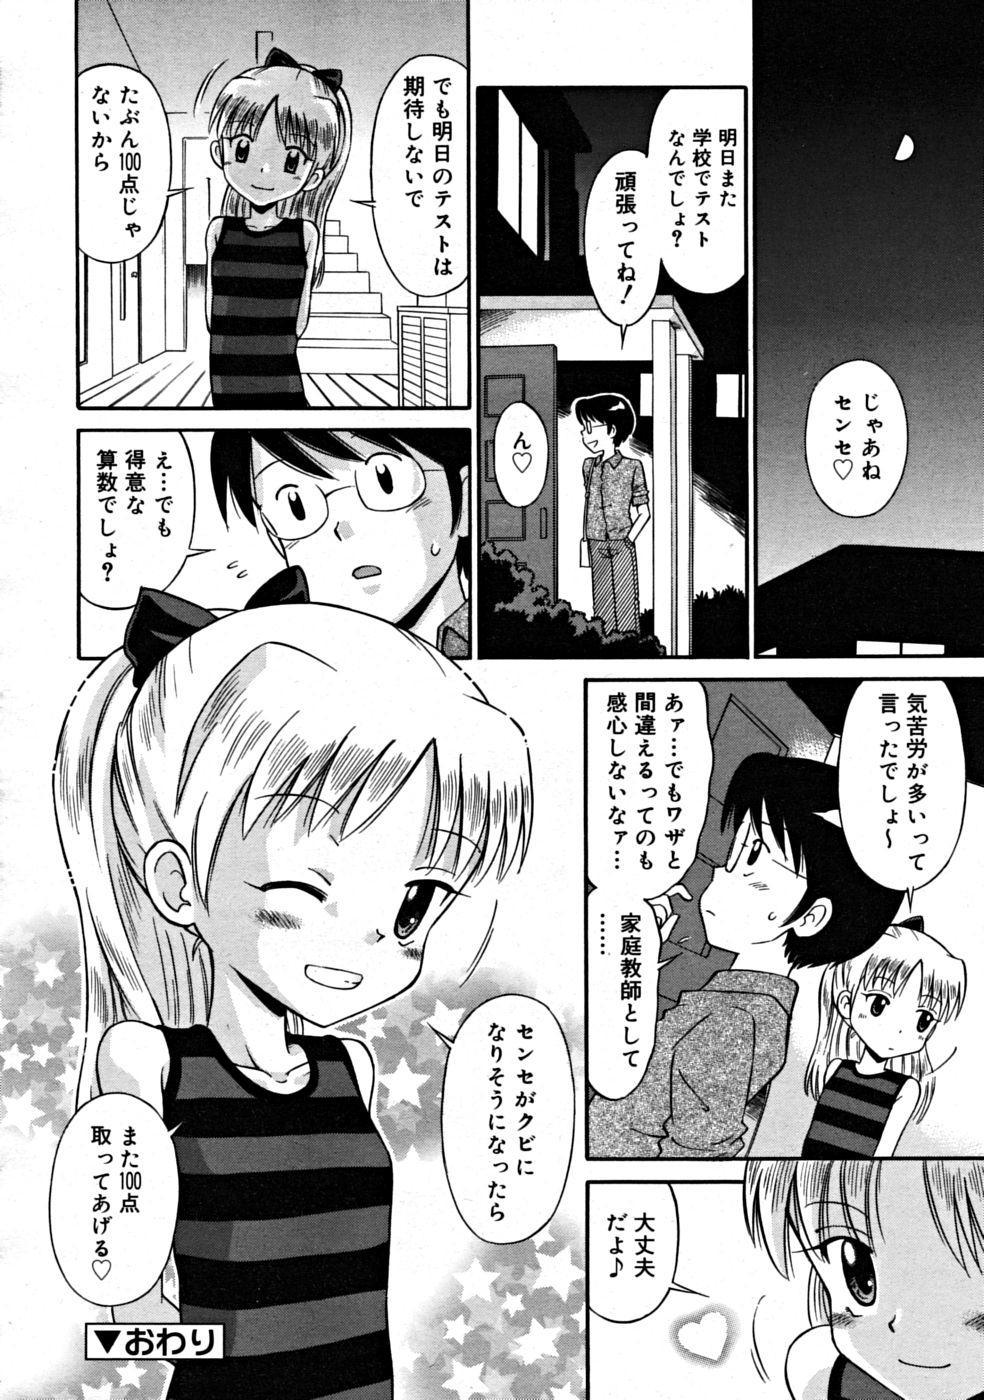 COMIC RiN 2008-08 Vol.44 271